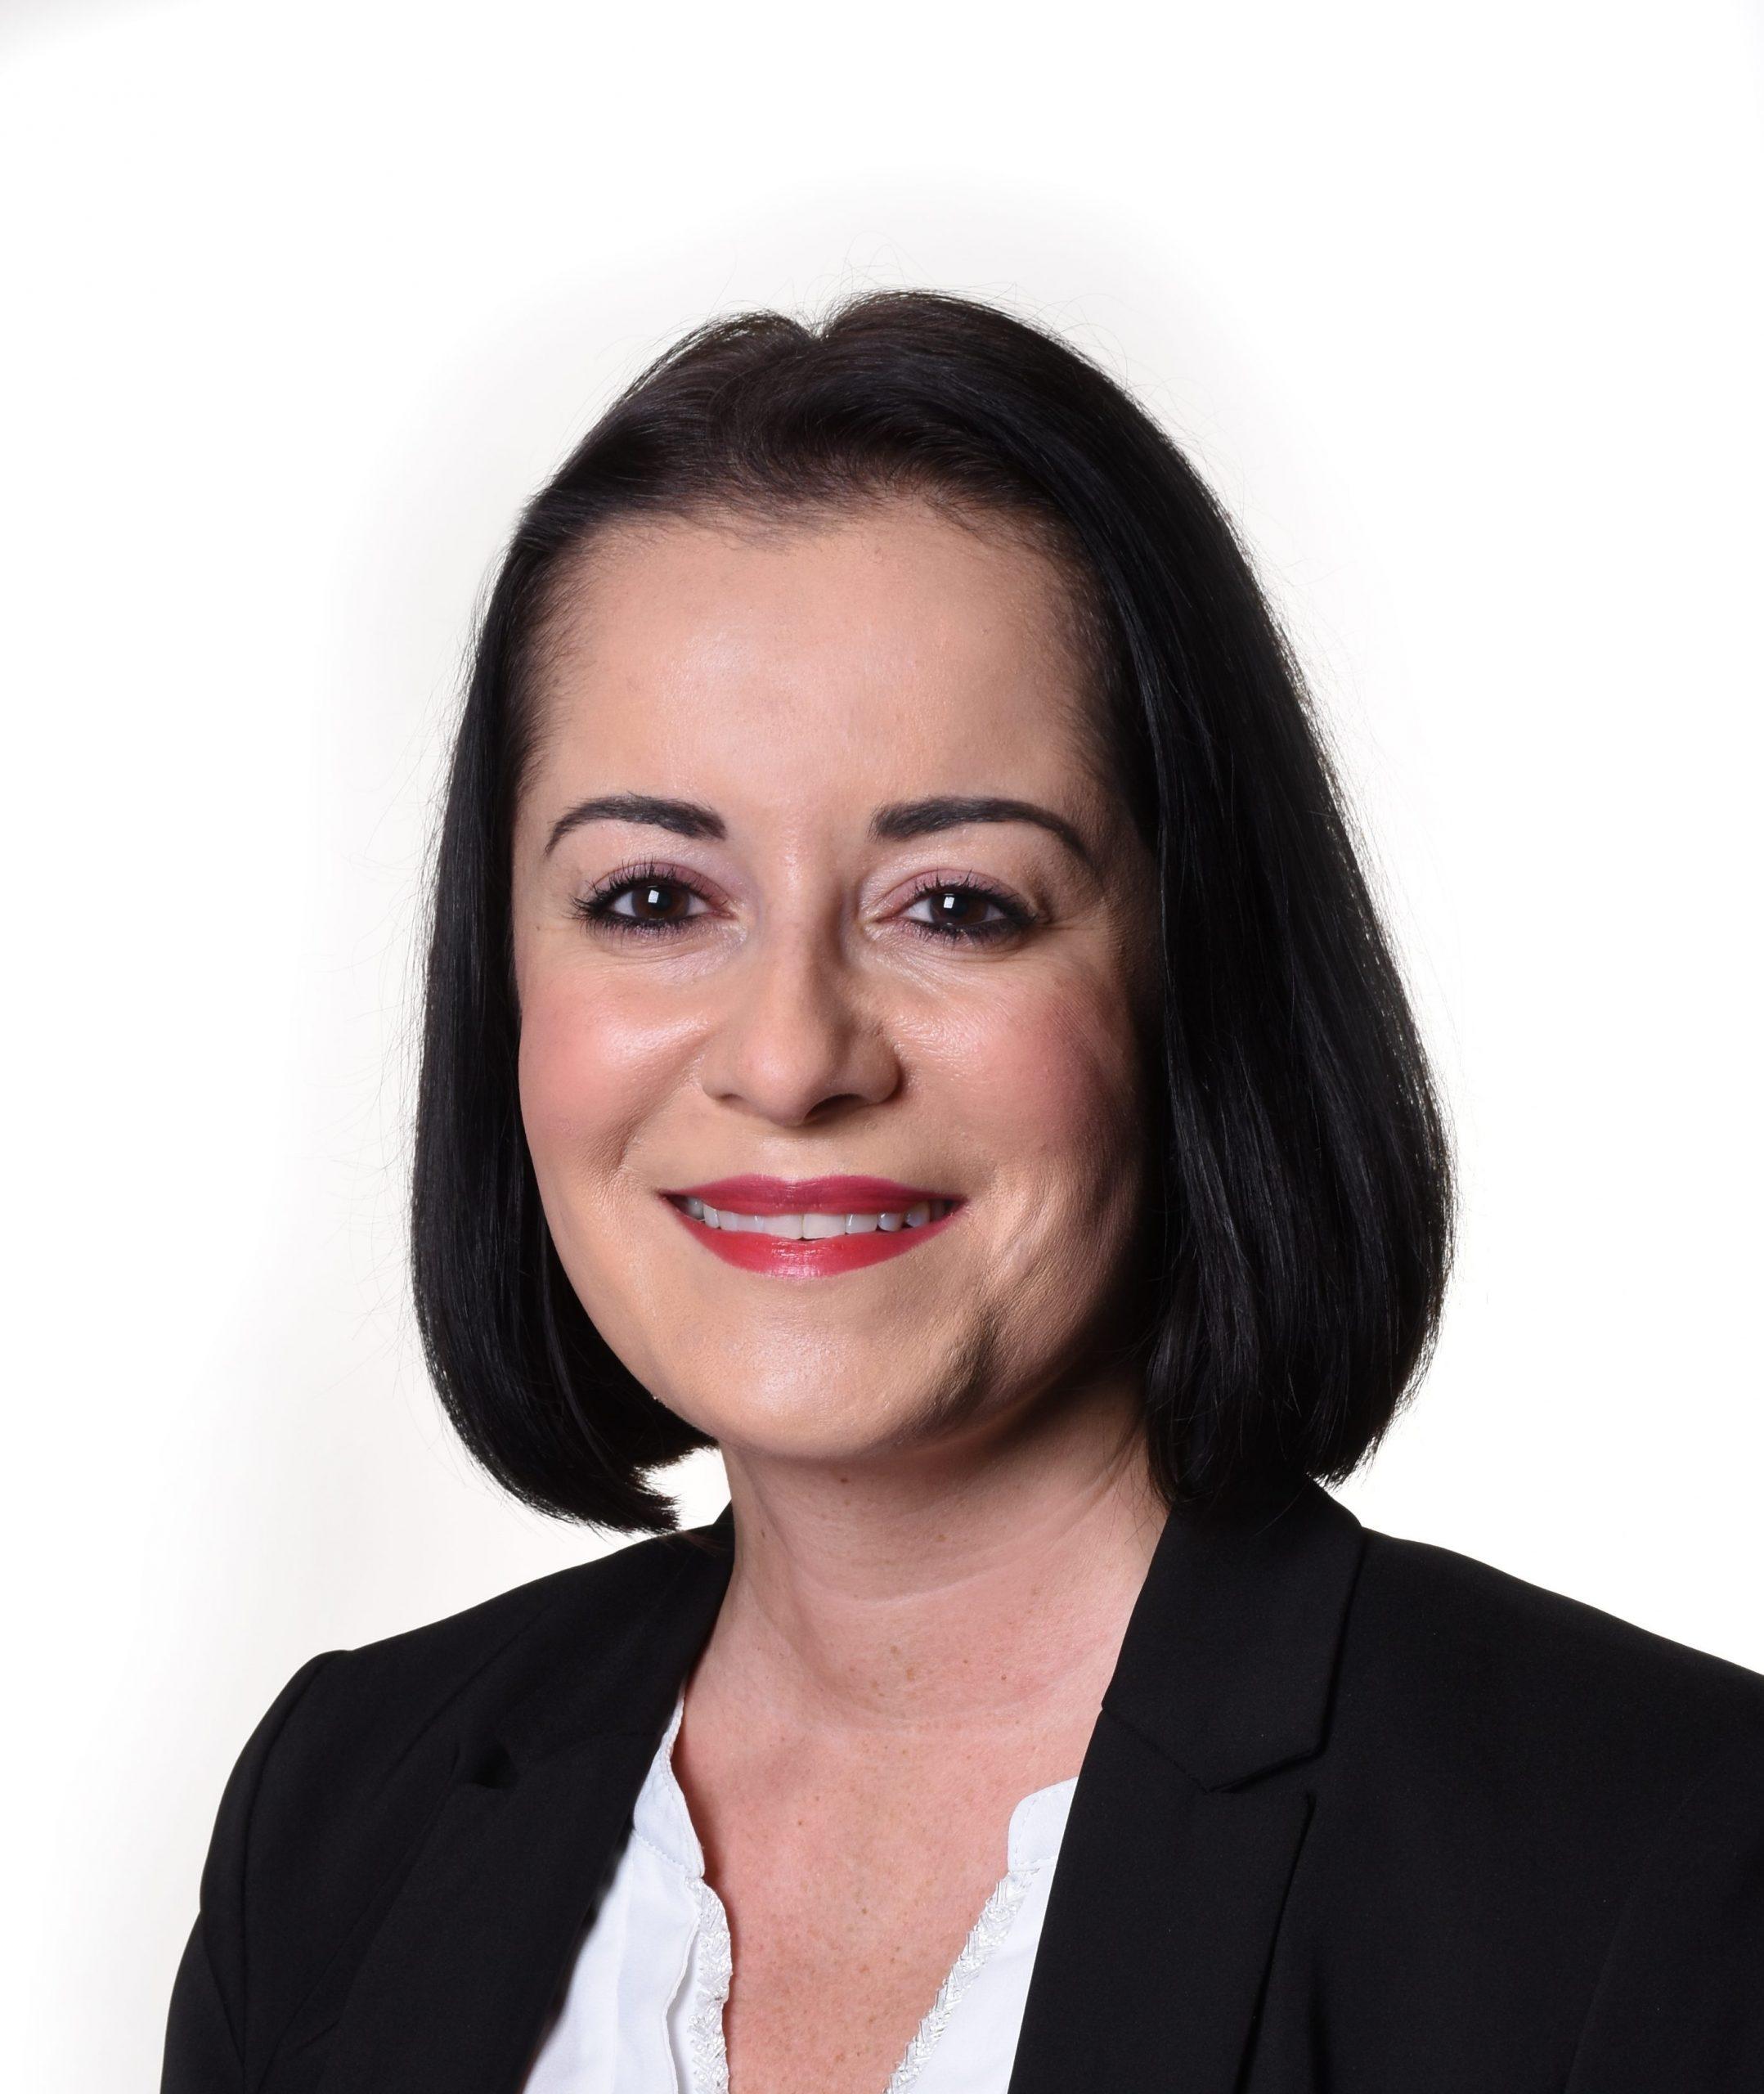 Belinda Ahmadi